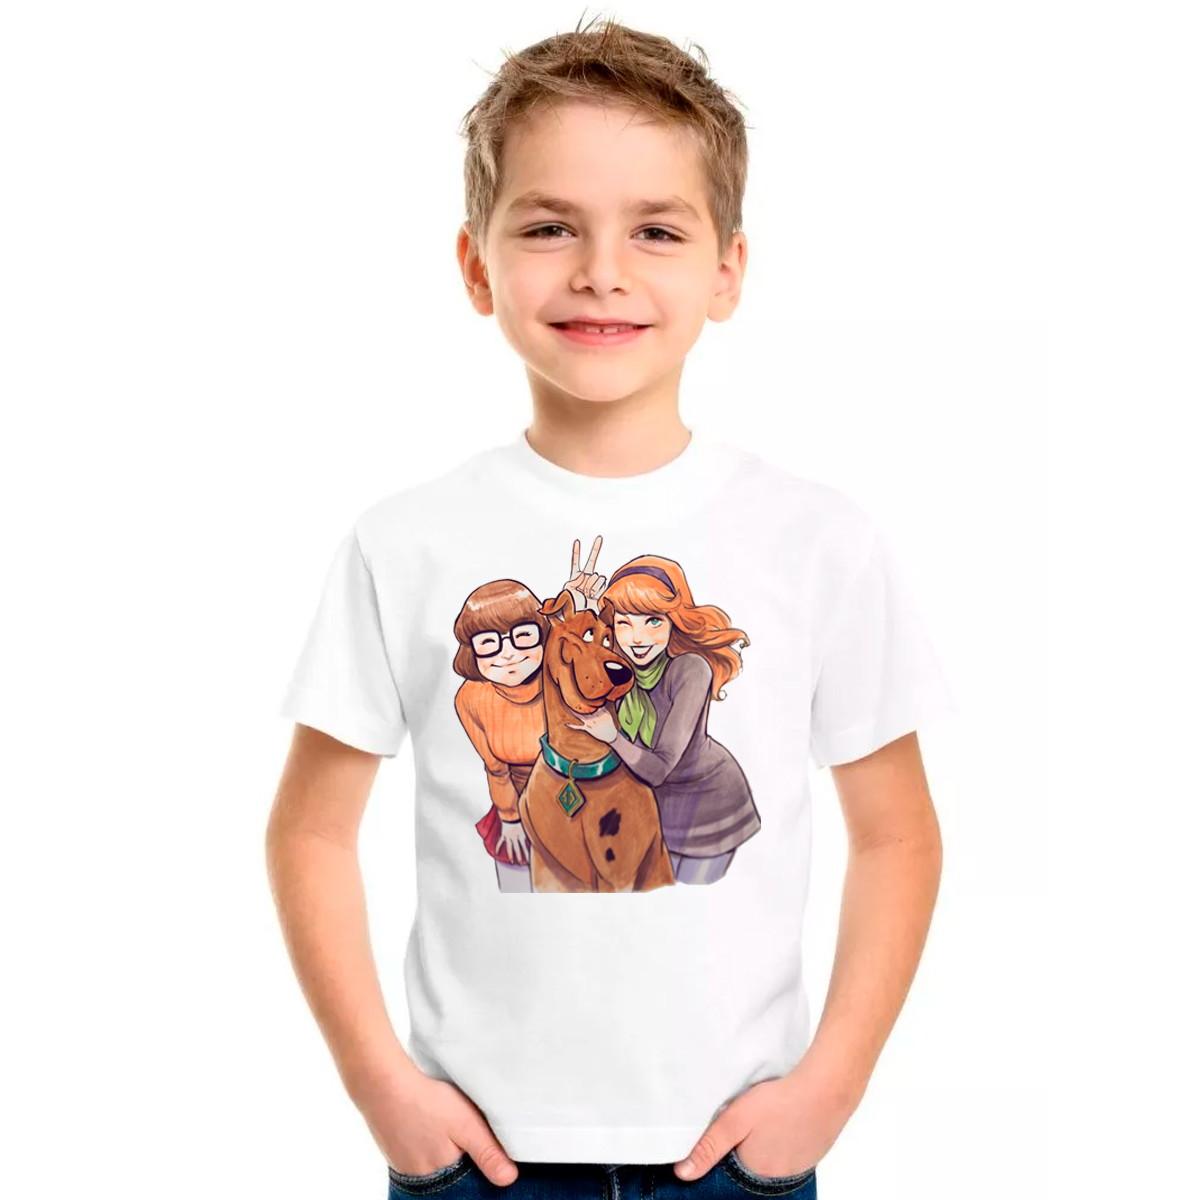 Camiseta Desenho Scooby Doo Camisa Velma Adulto Infantil No Elo7